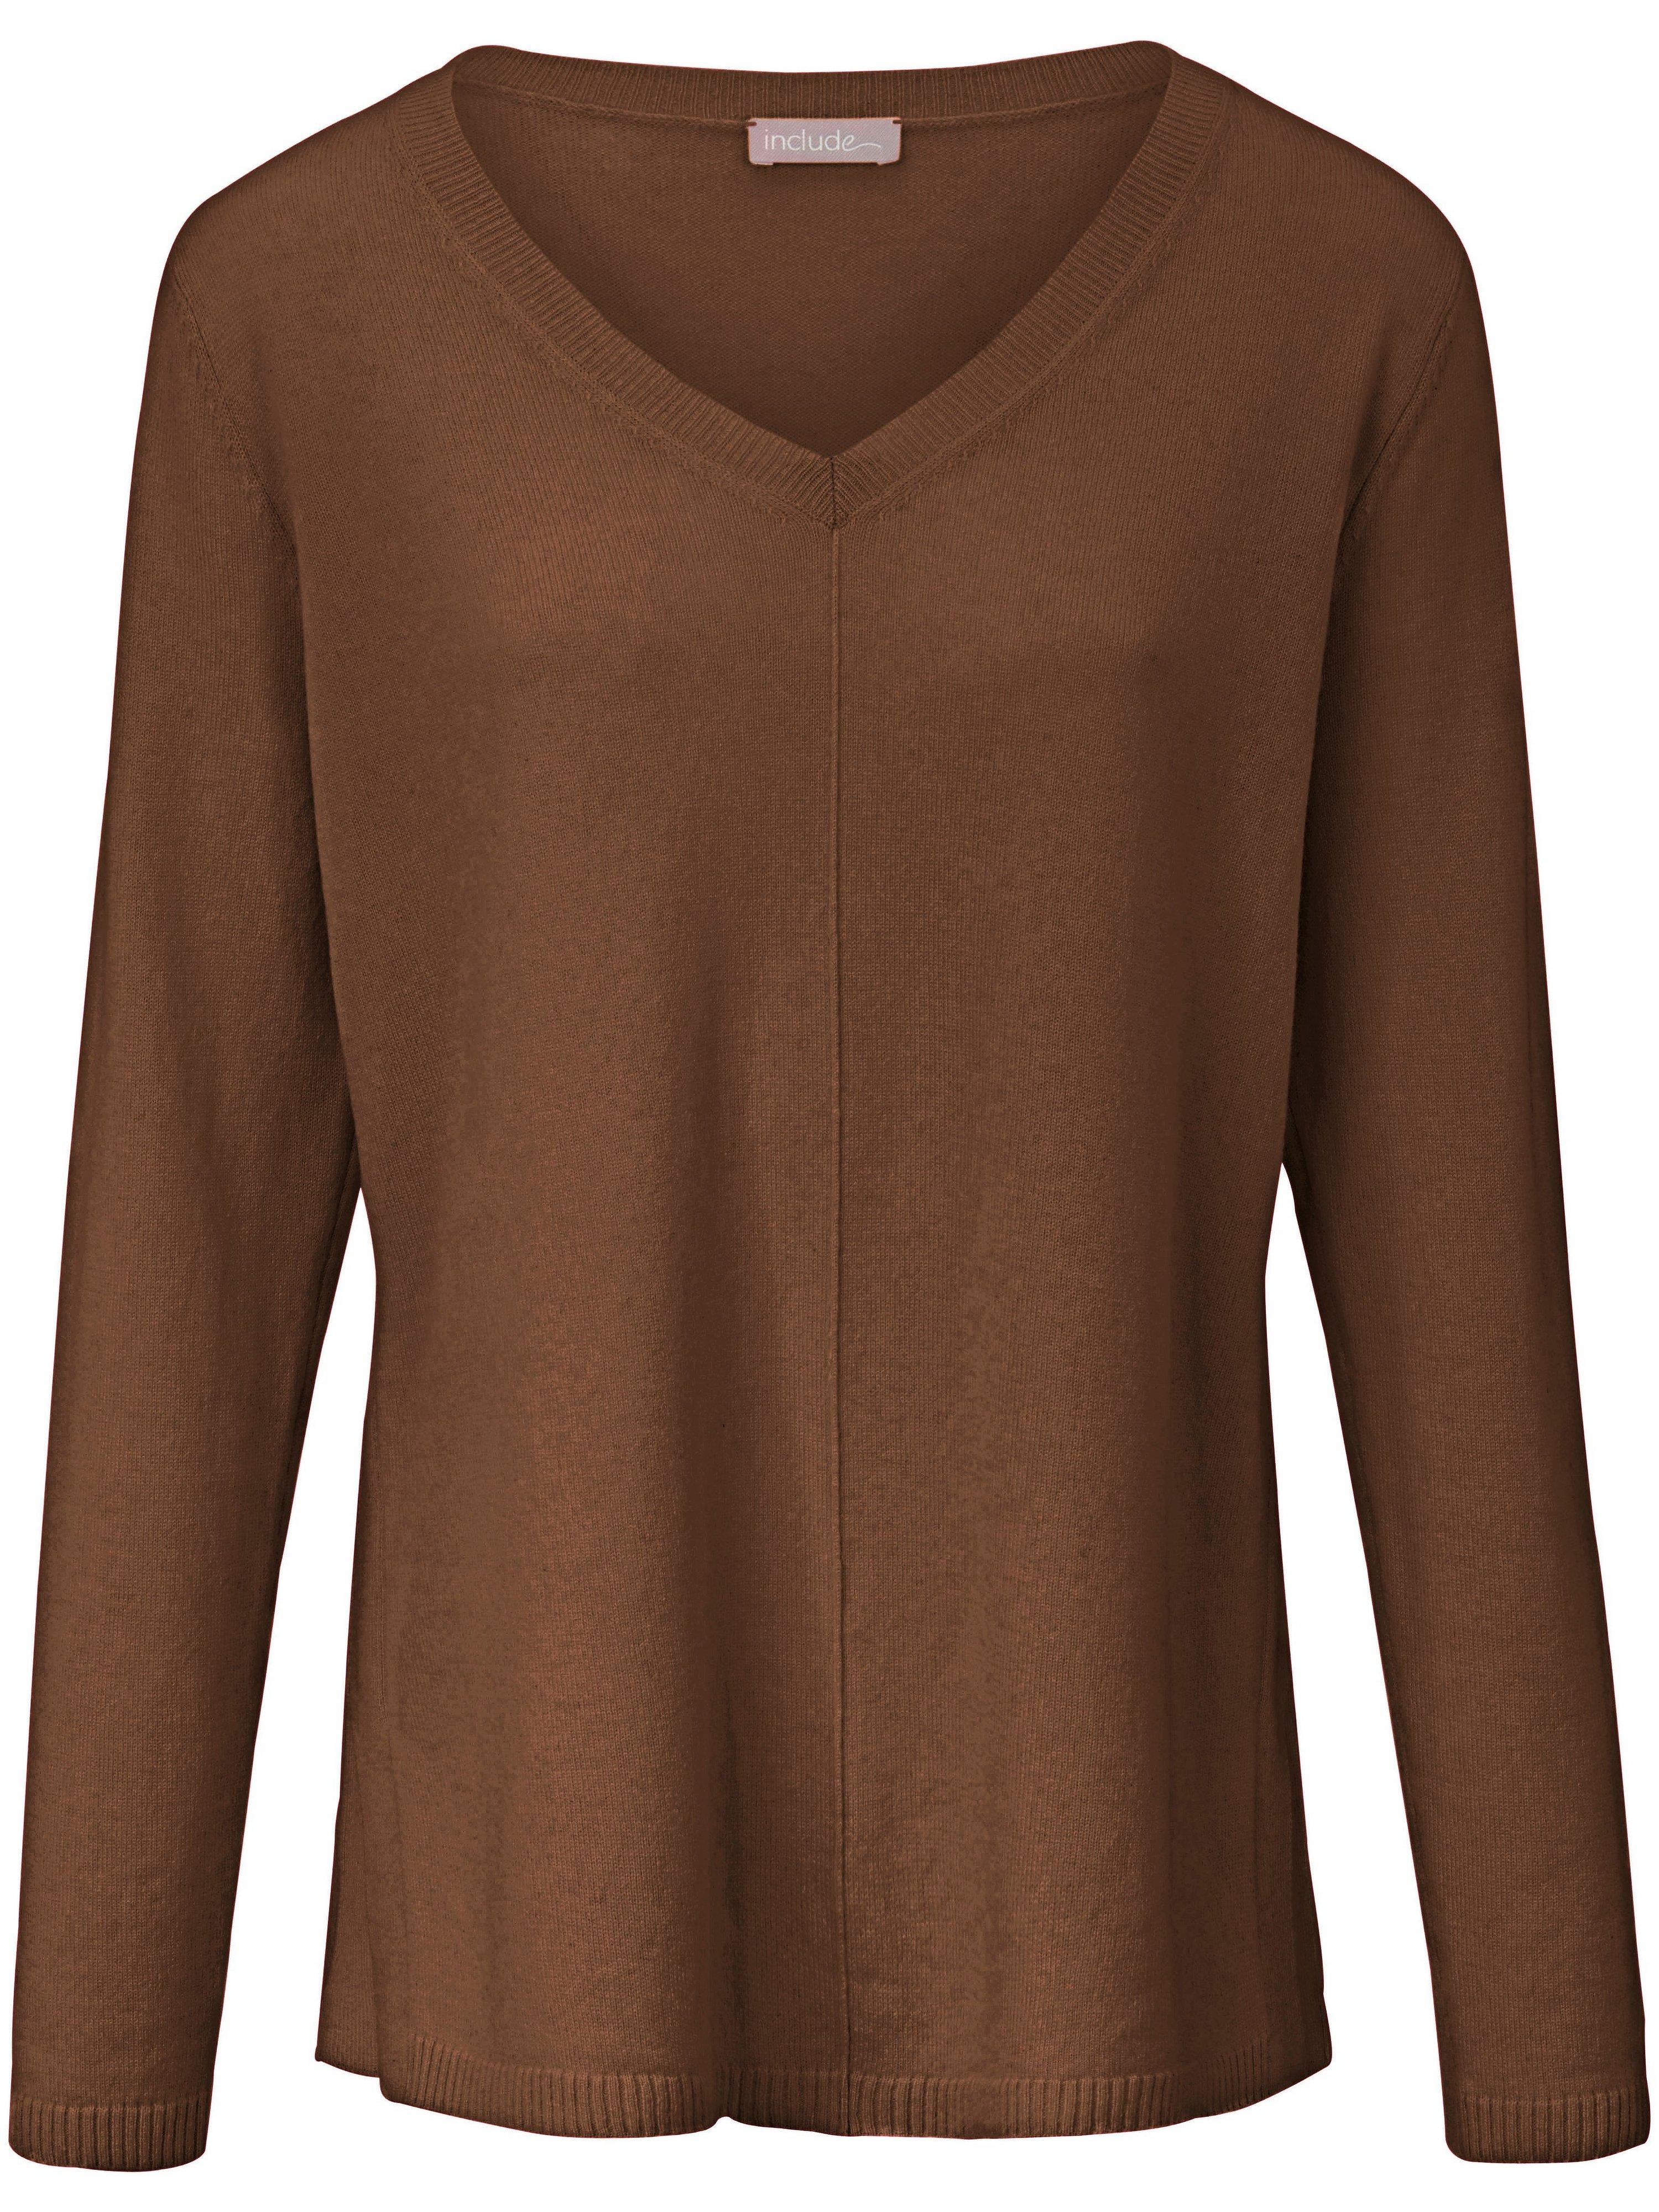 V-neck jumper in 100% cashmere include brown